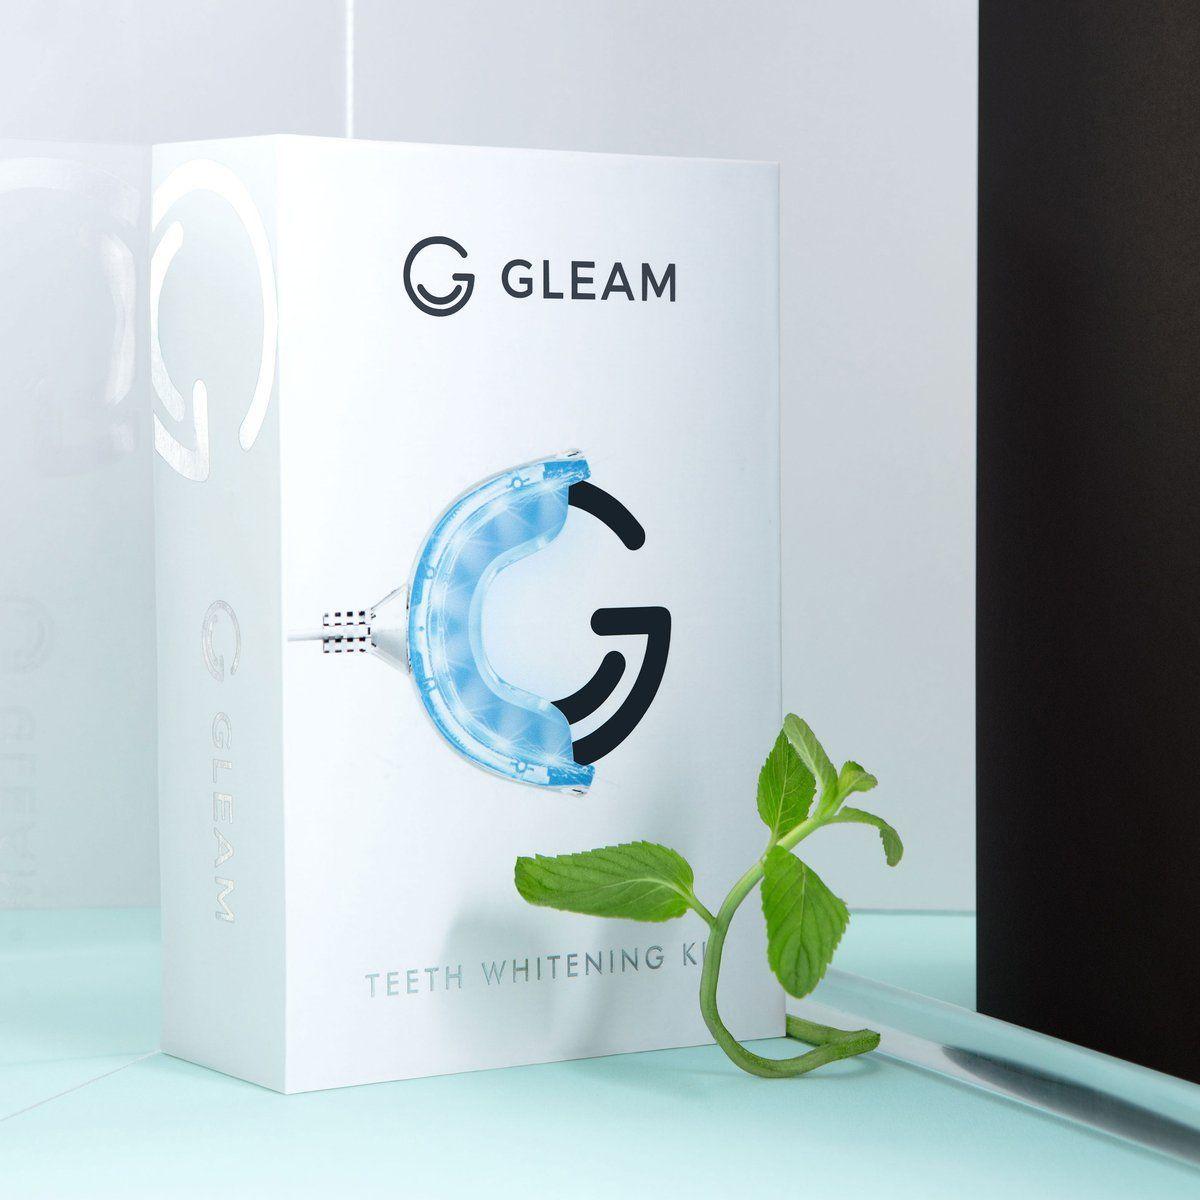 Gleam™ Teeth Whitening System #toothpasteteethwhitening #bestteethwhitening